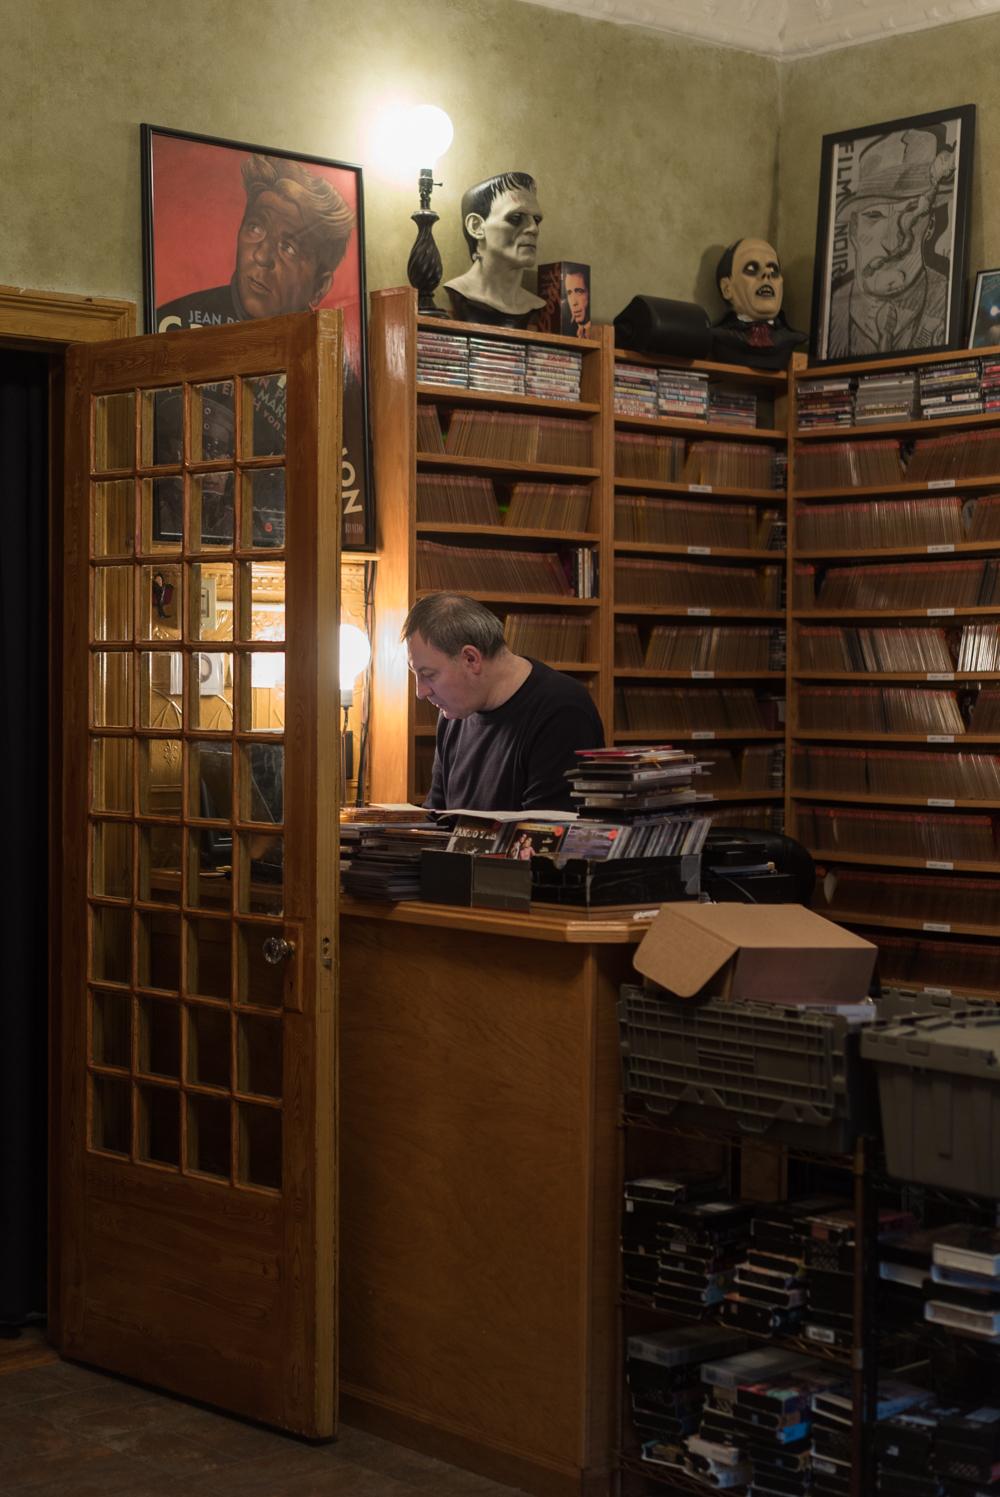 Will Malitek has been running Film Noir Cinema for over 15 years.